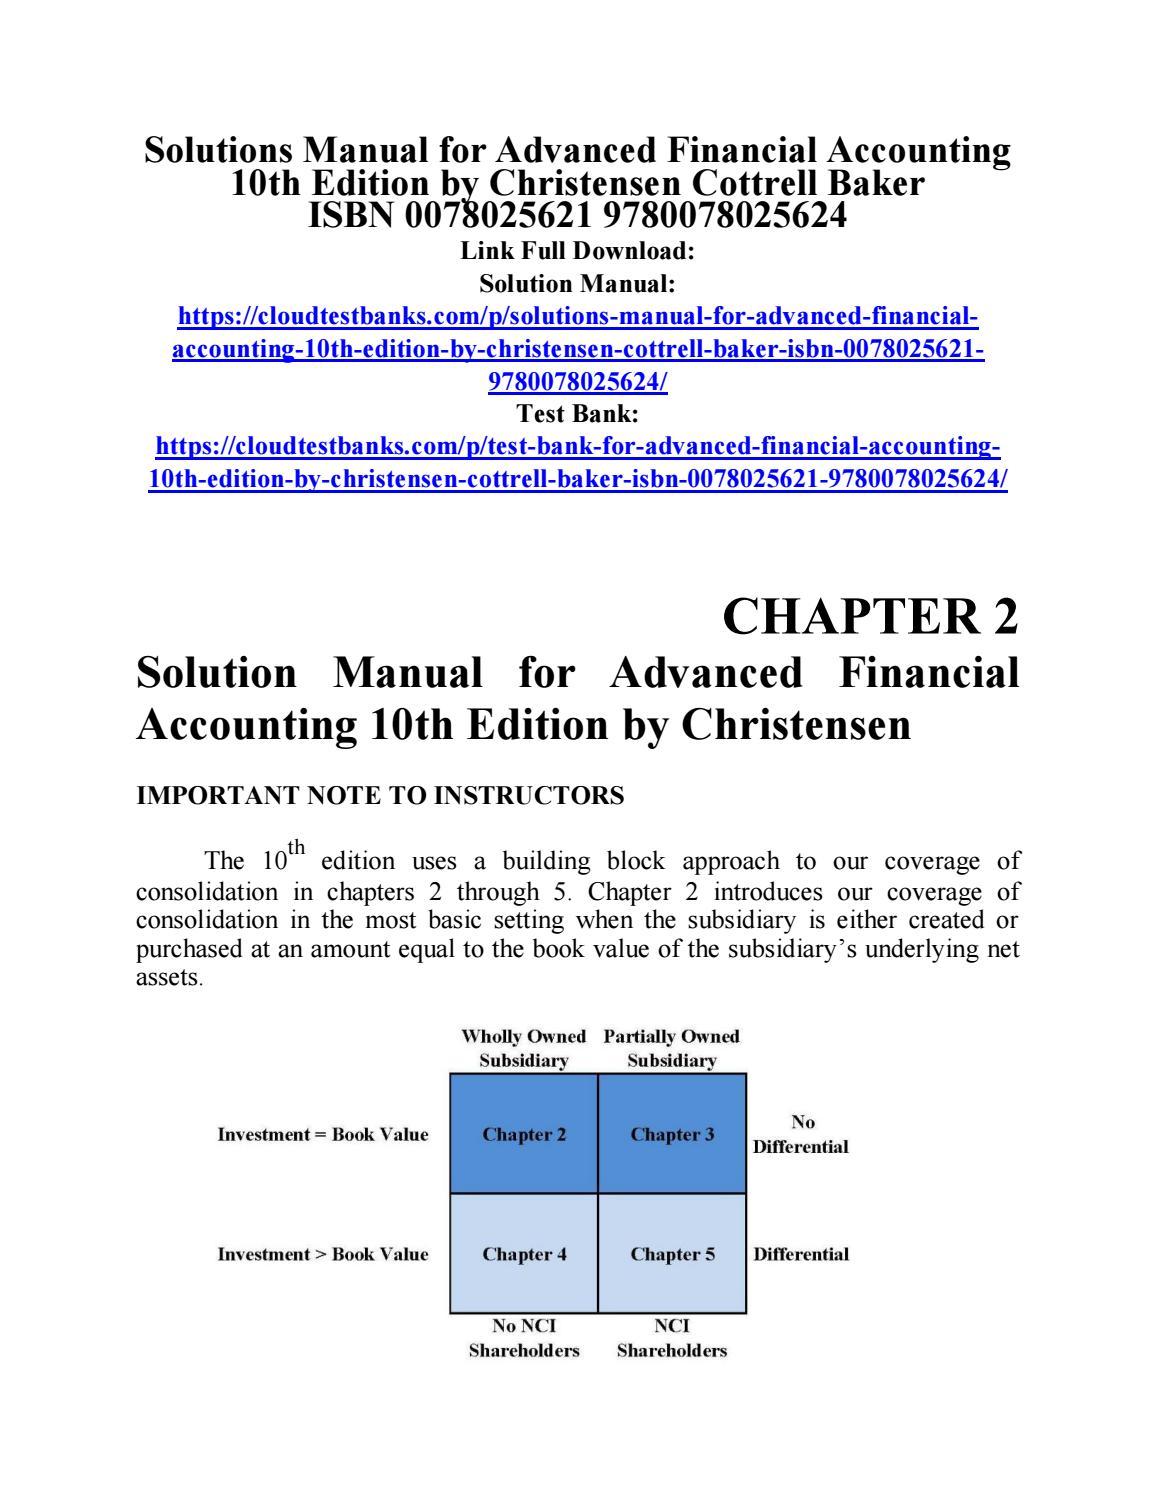 Solution Manual Advanced Financial Accounting 10th Edition By Christensen 9780078025624 By Shywe Issuu